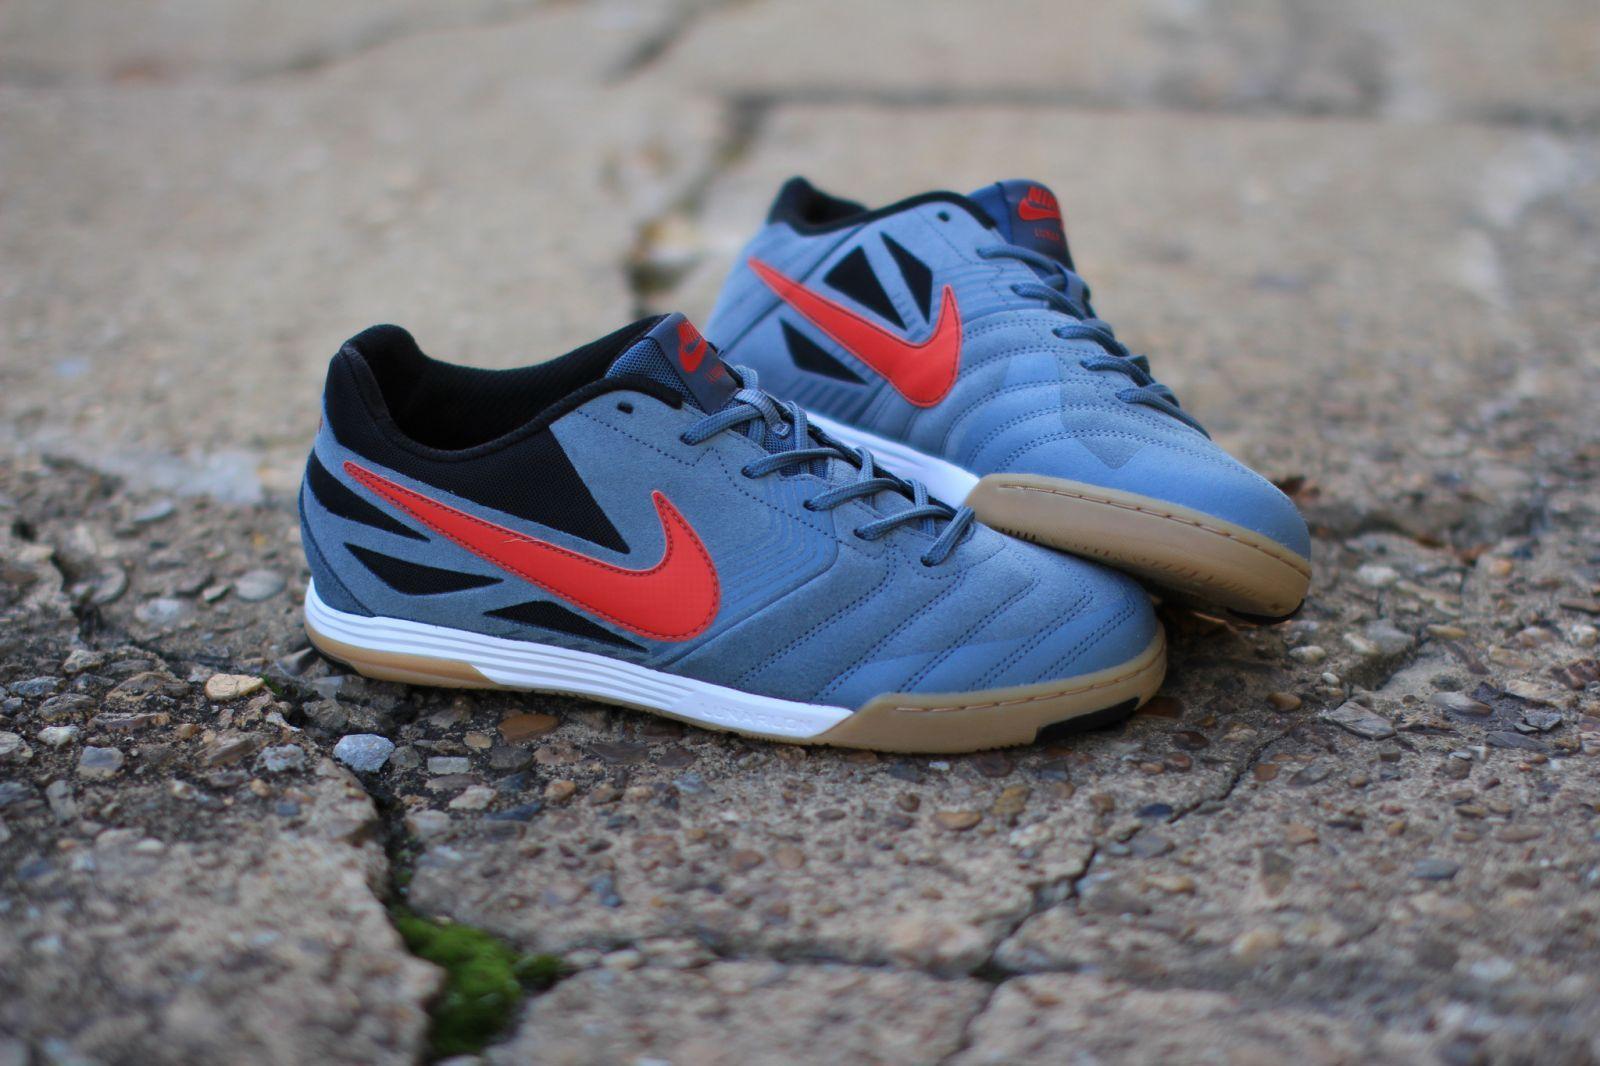 9e581c141ff5 ... Nike SB Lunar Gato - Armory Slate University Red .